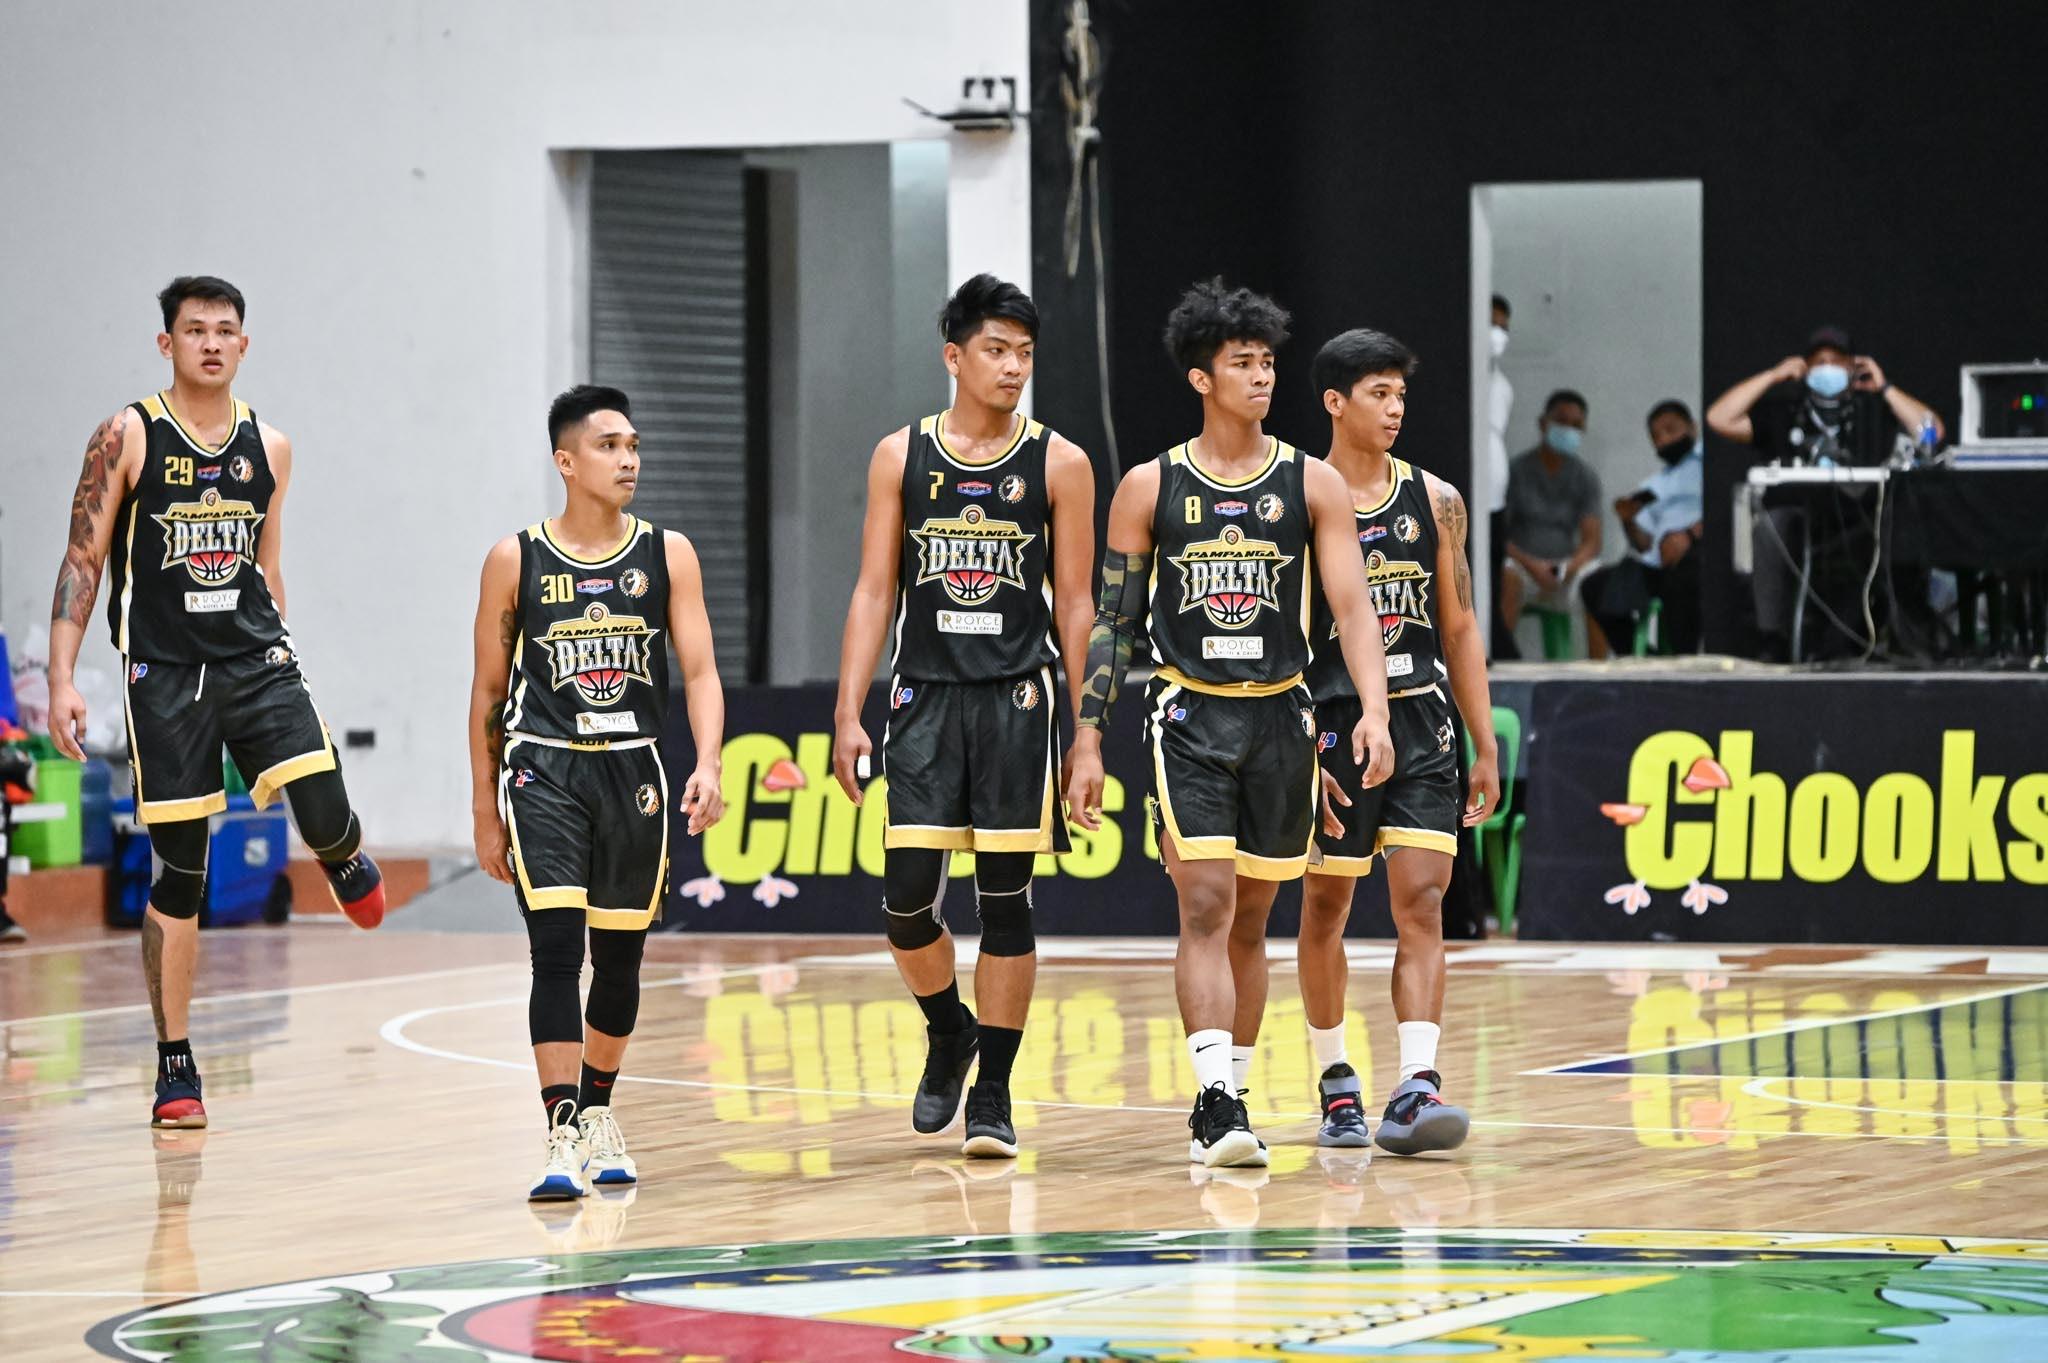 2021-Chooks-to-Go-NBL-Laguna-vs-Pampanga-DELTA Levi Hernandez, Pampanga torch Laguna for second straight win in NBL Basketball NBL News  - philippine sports news